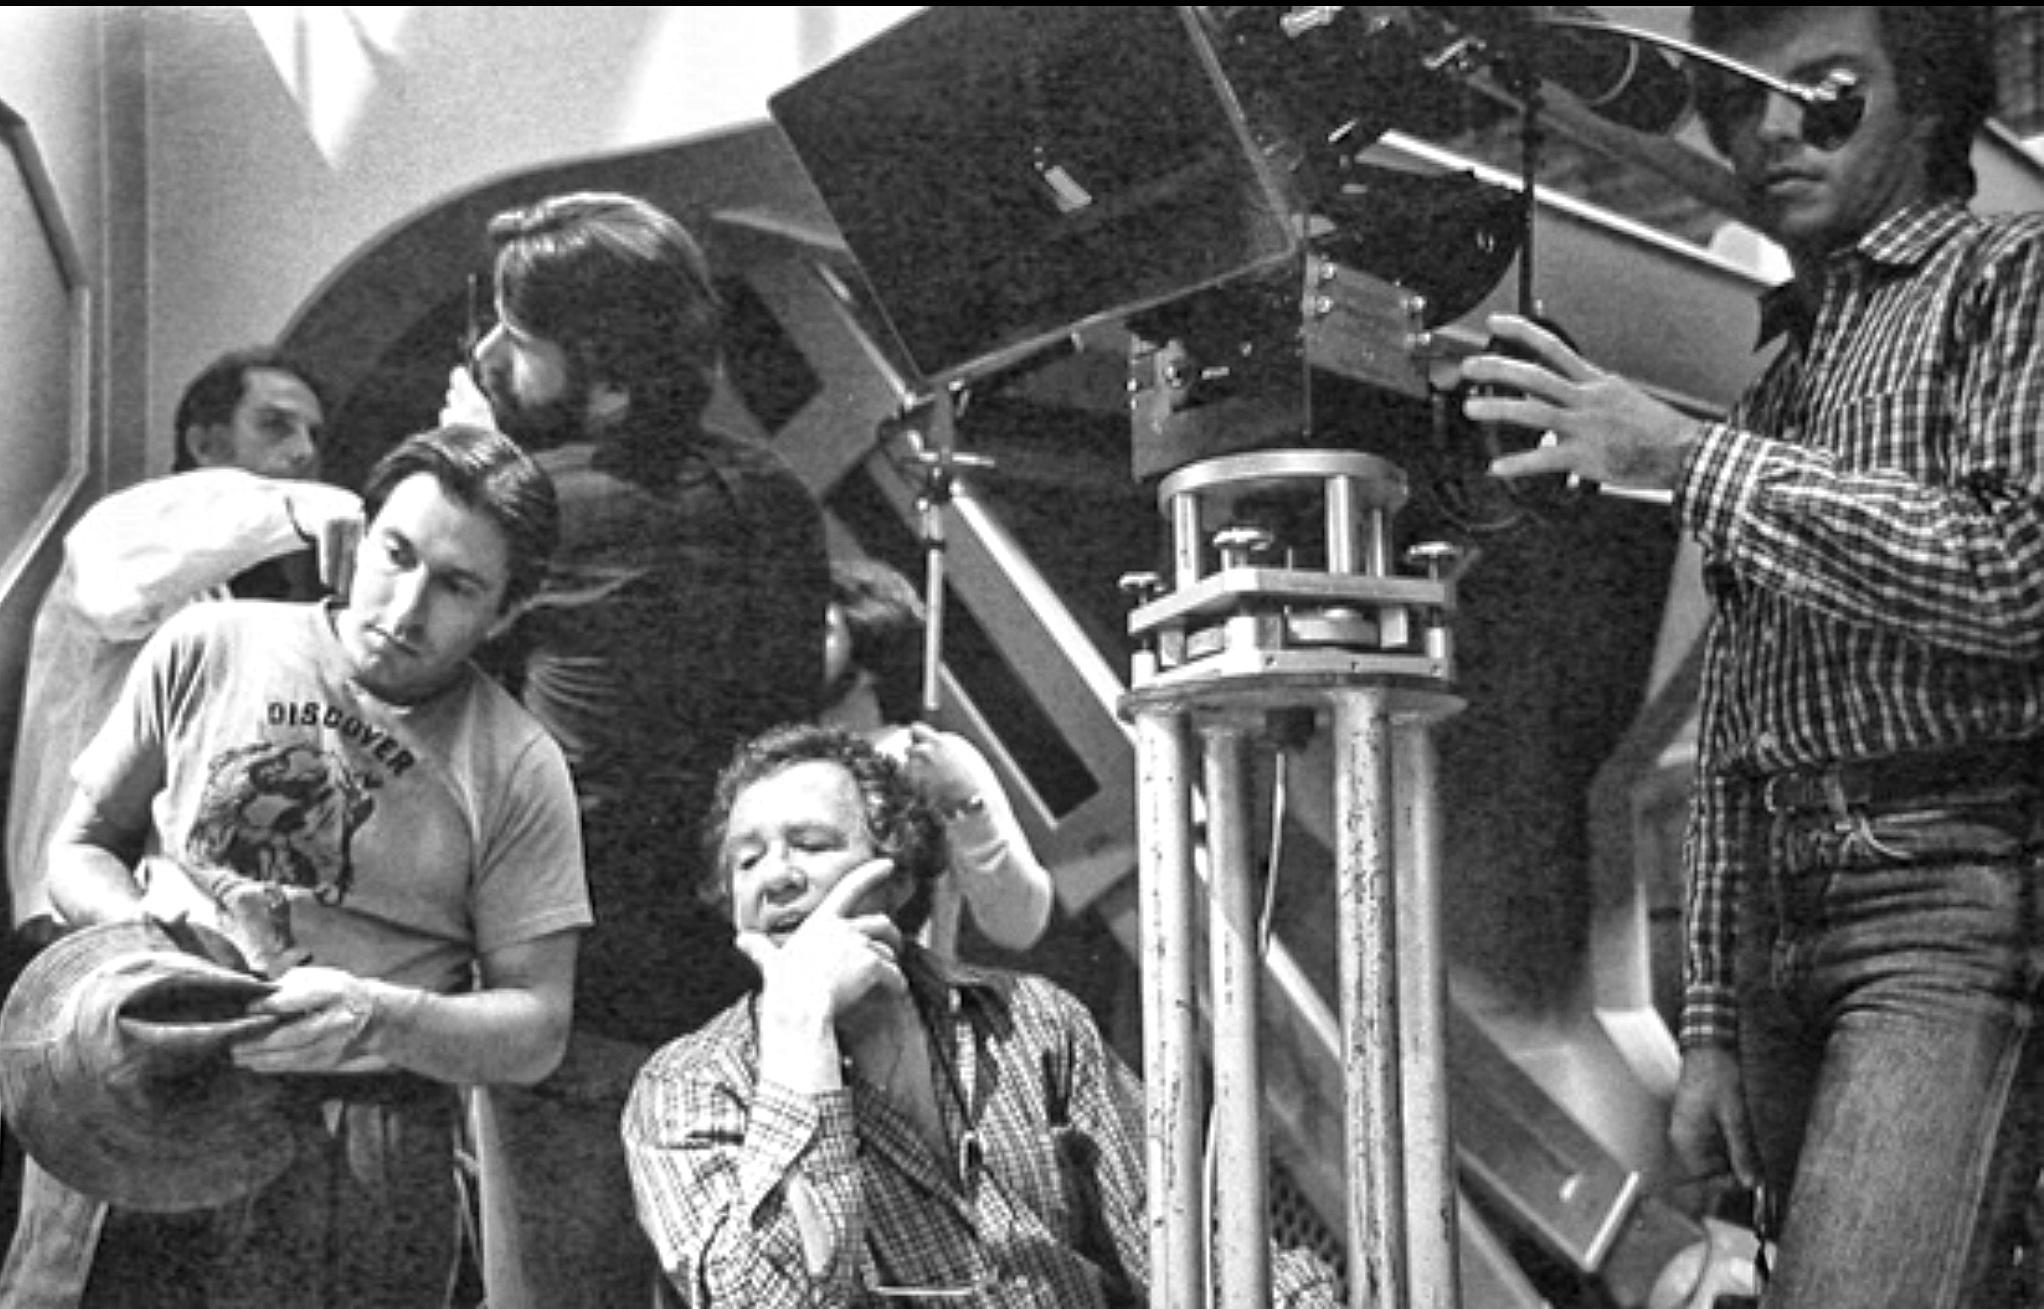 Gayne Rescher, Craig Denault, and Nicholas Meyer